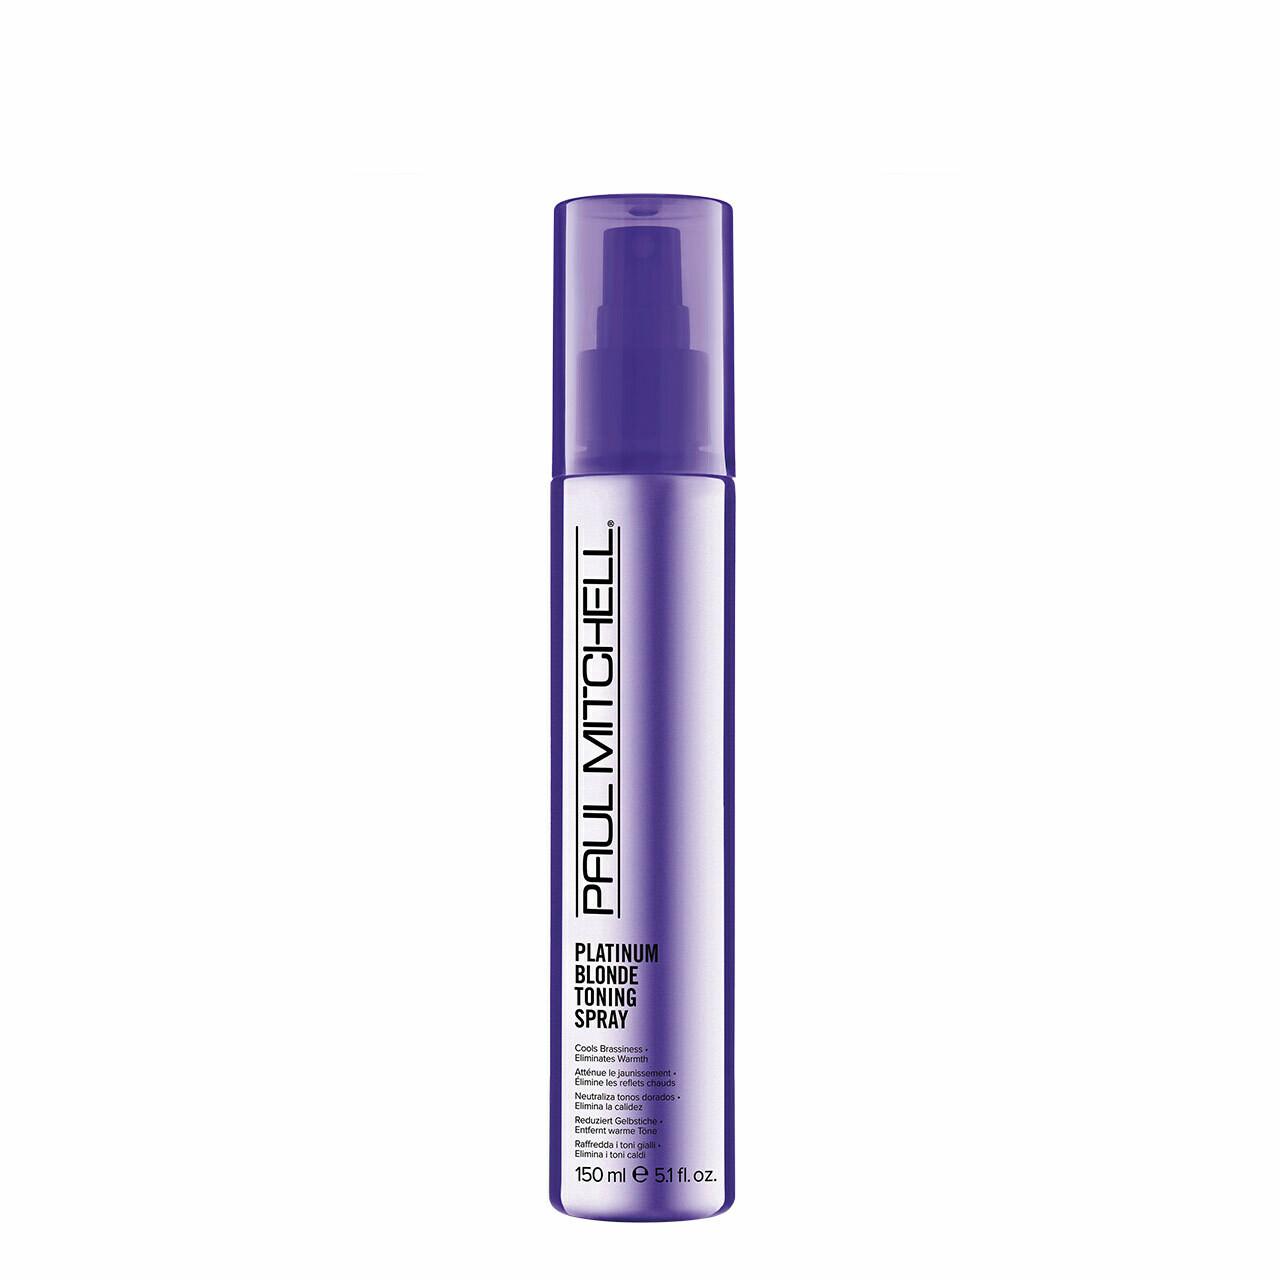 Platinum Blonde Toning Spray 150ml